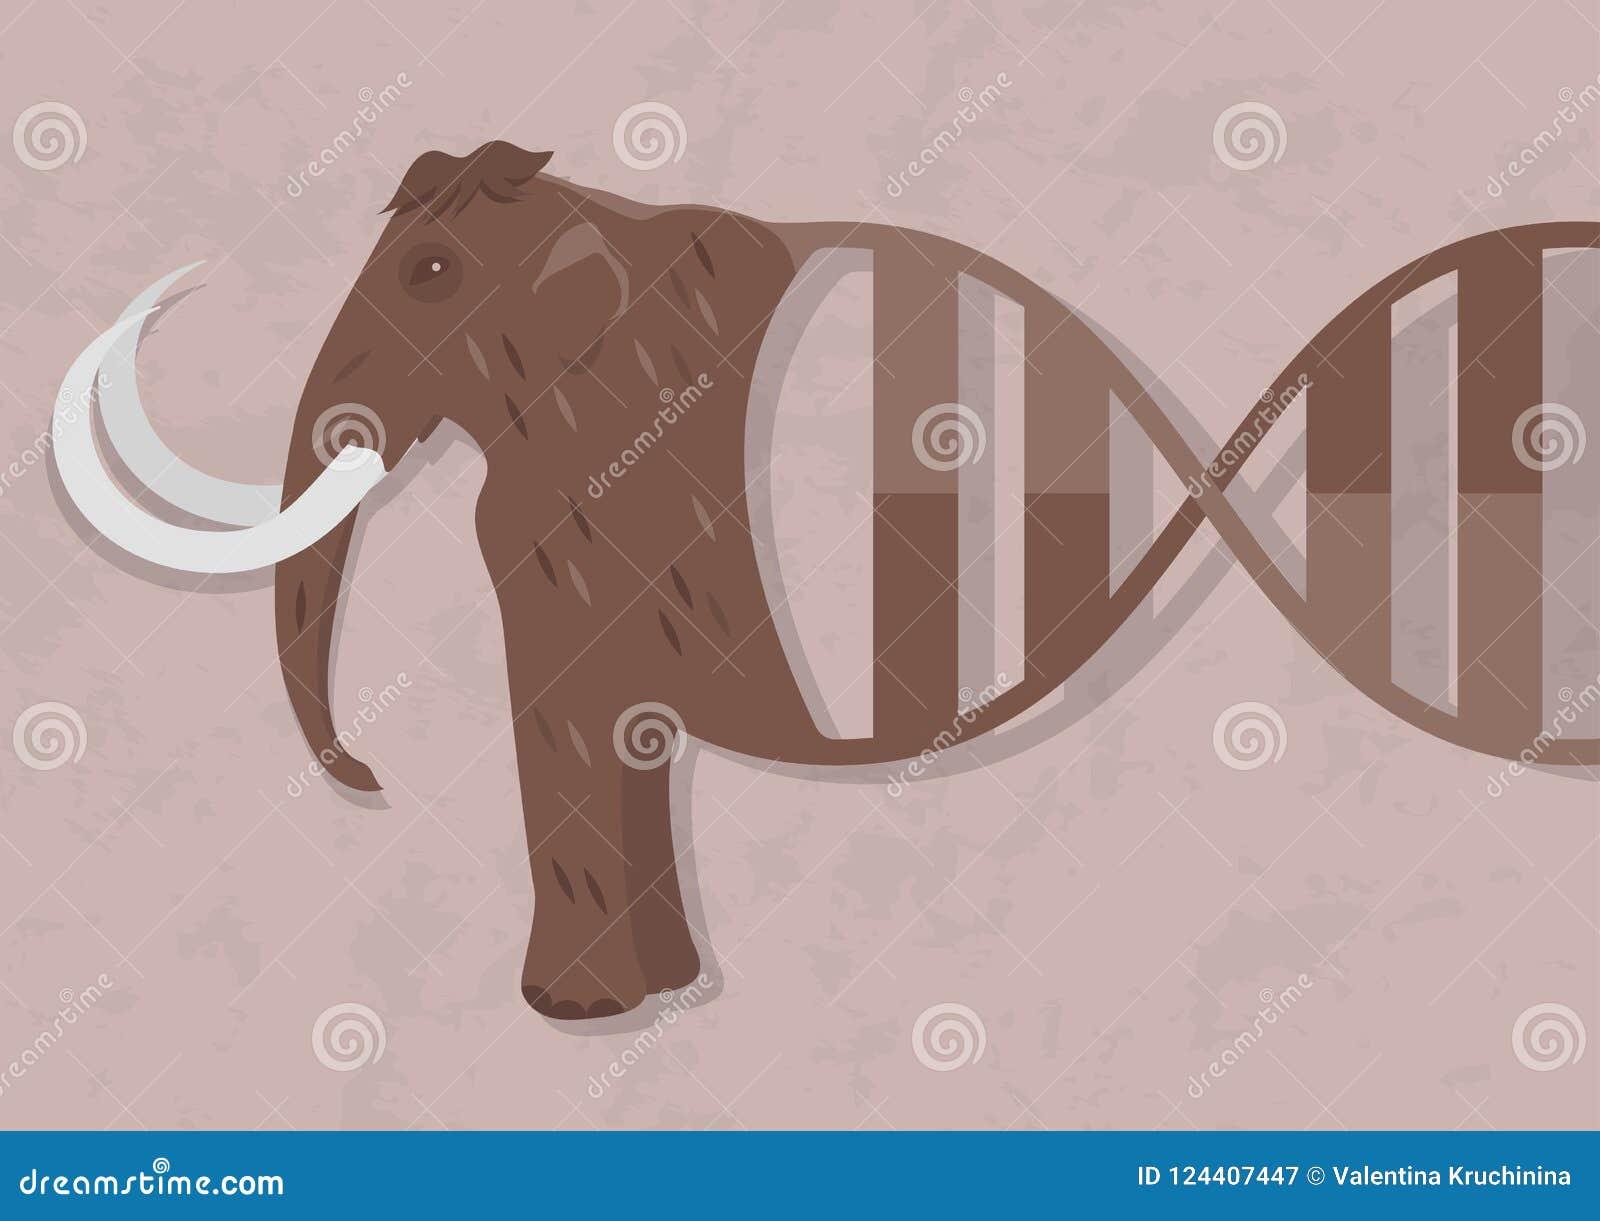 disadvantages of cloning extinct animals